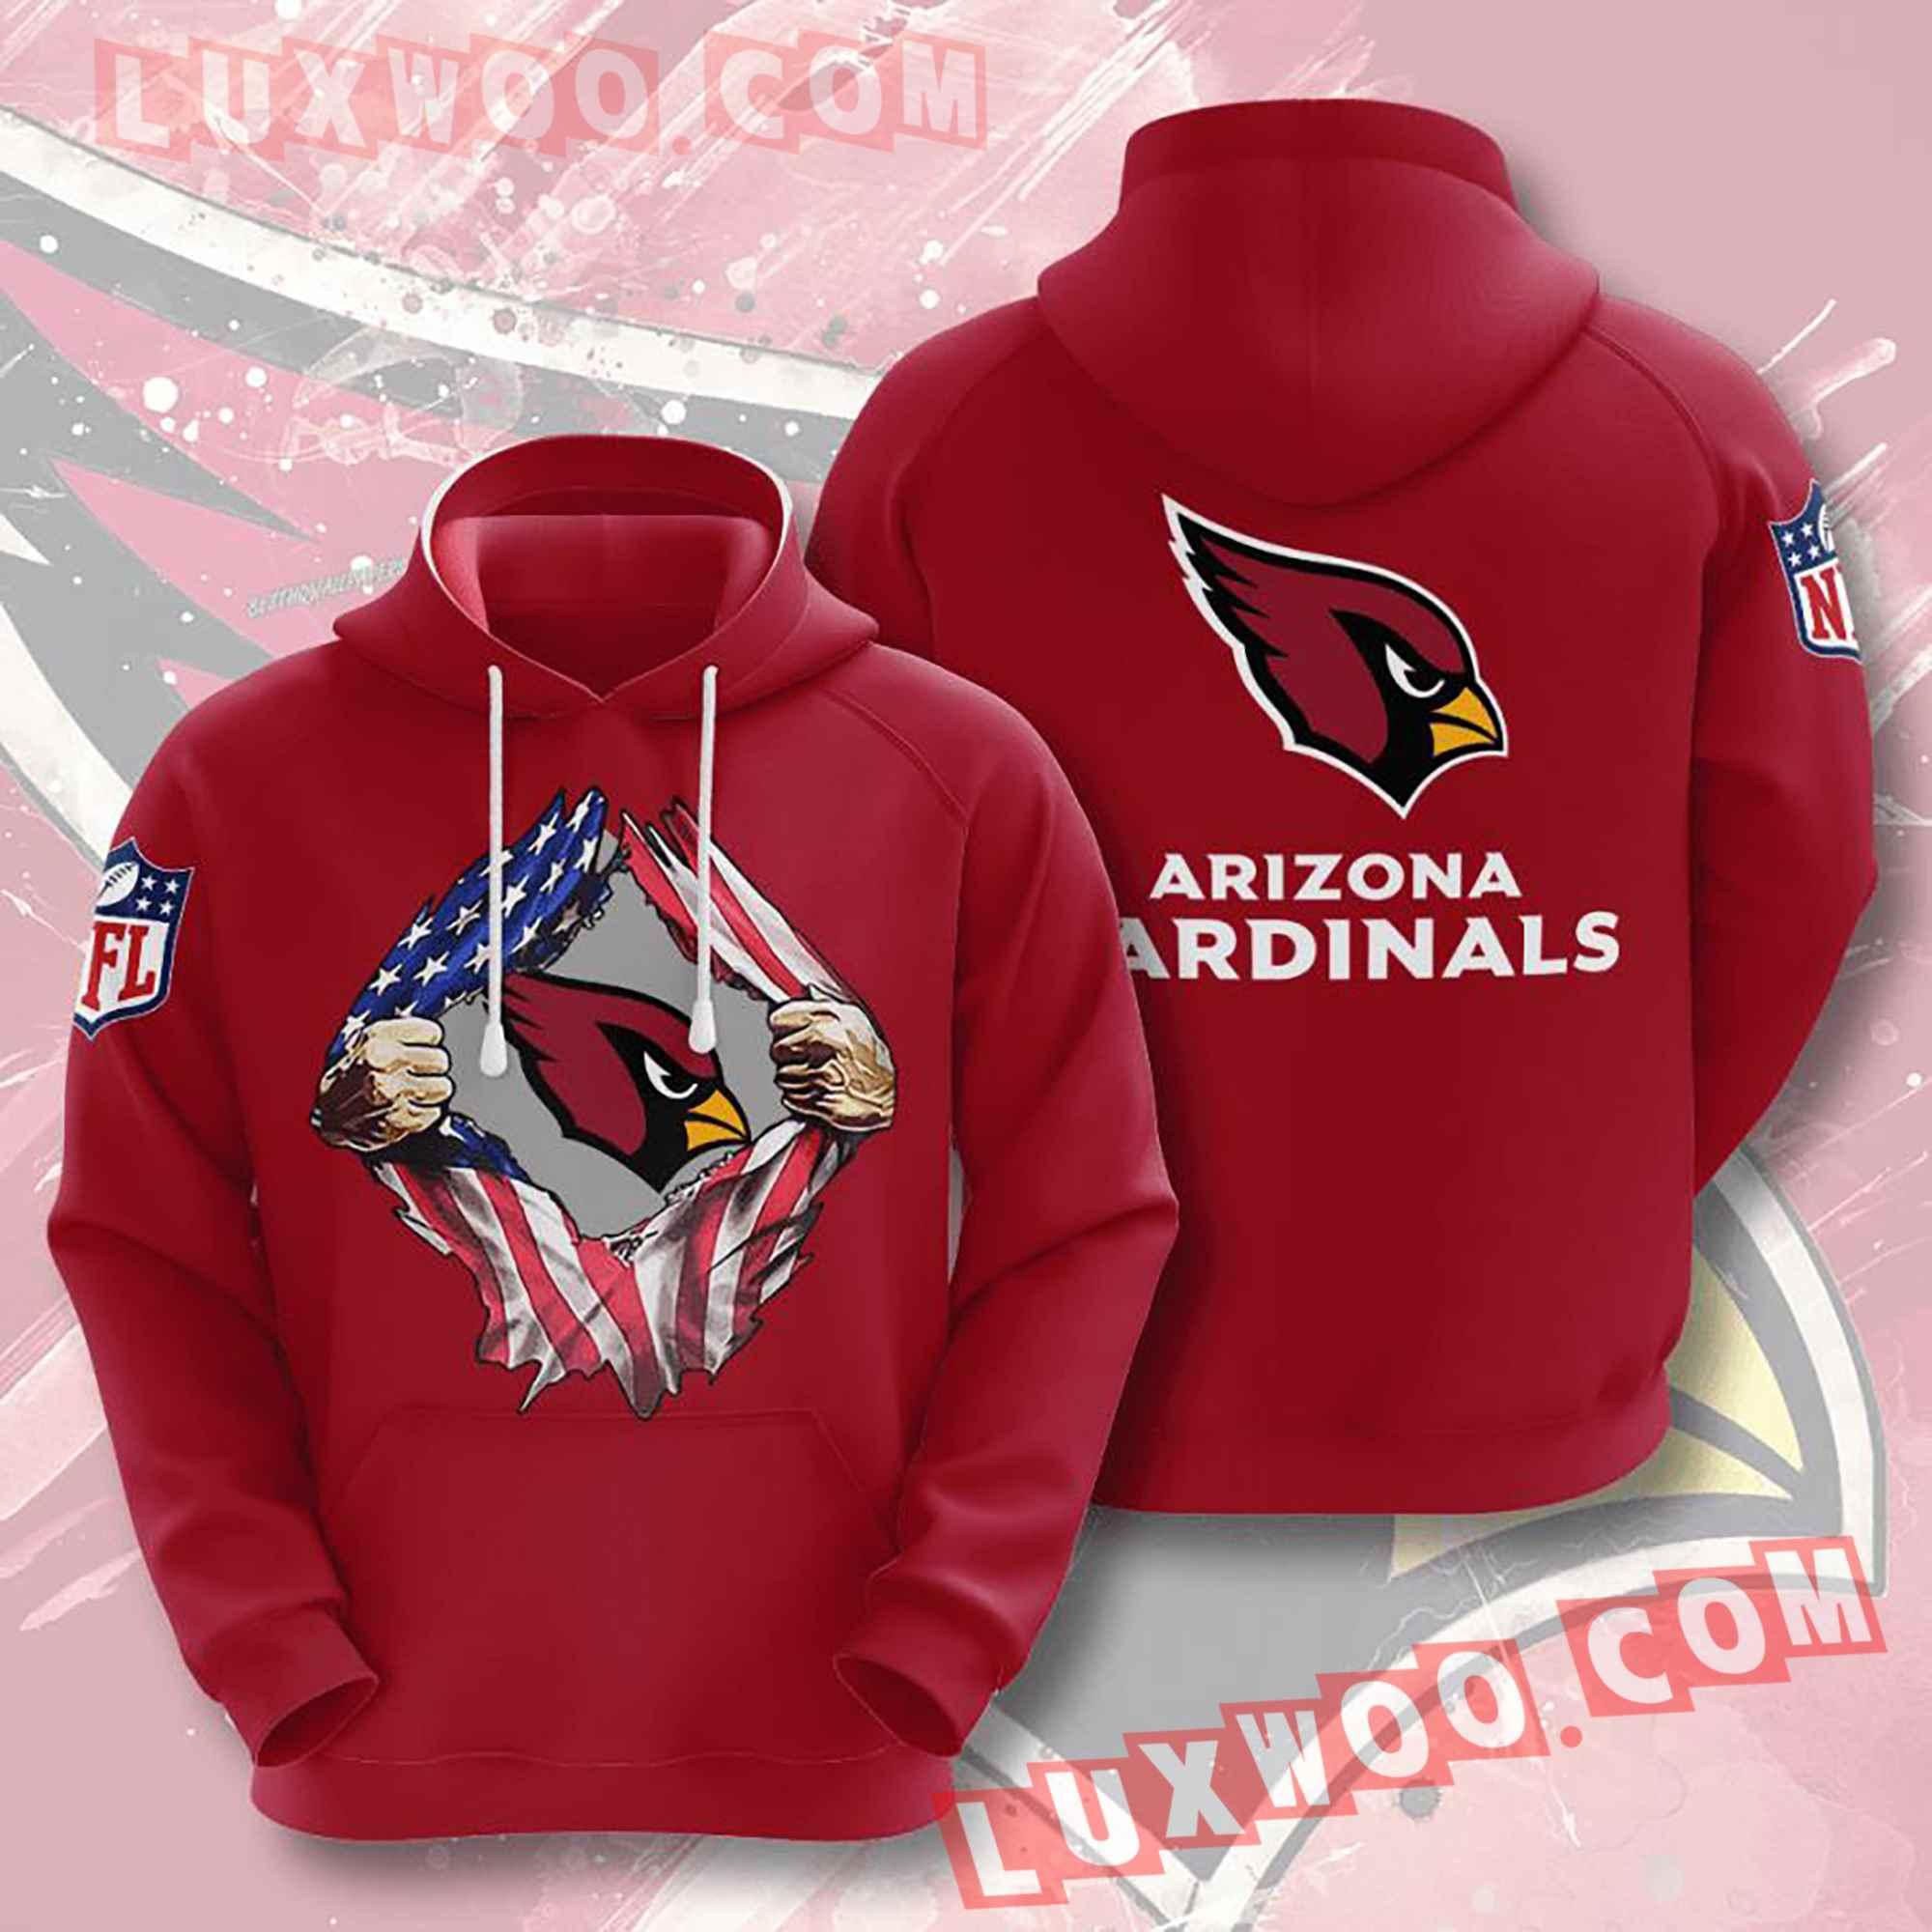 Nfl Arizona Cardinals Hoodies Custom All Over Print 3d Pullover Hoodie V8